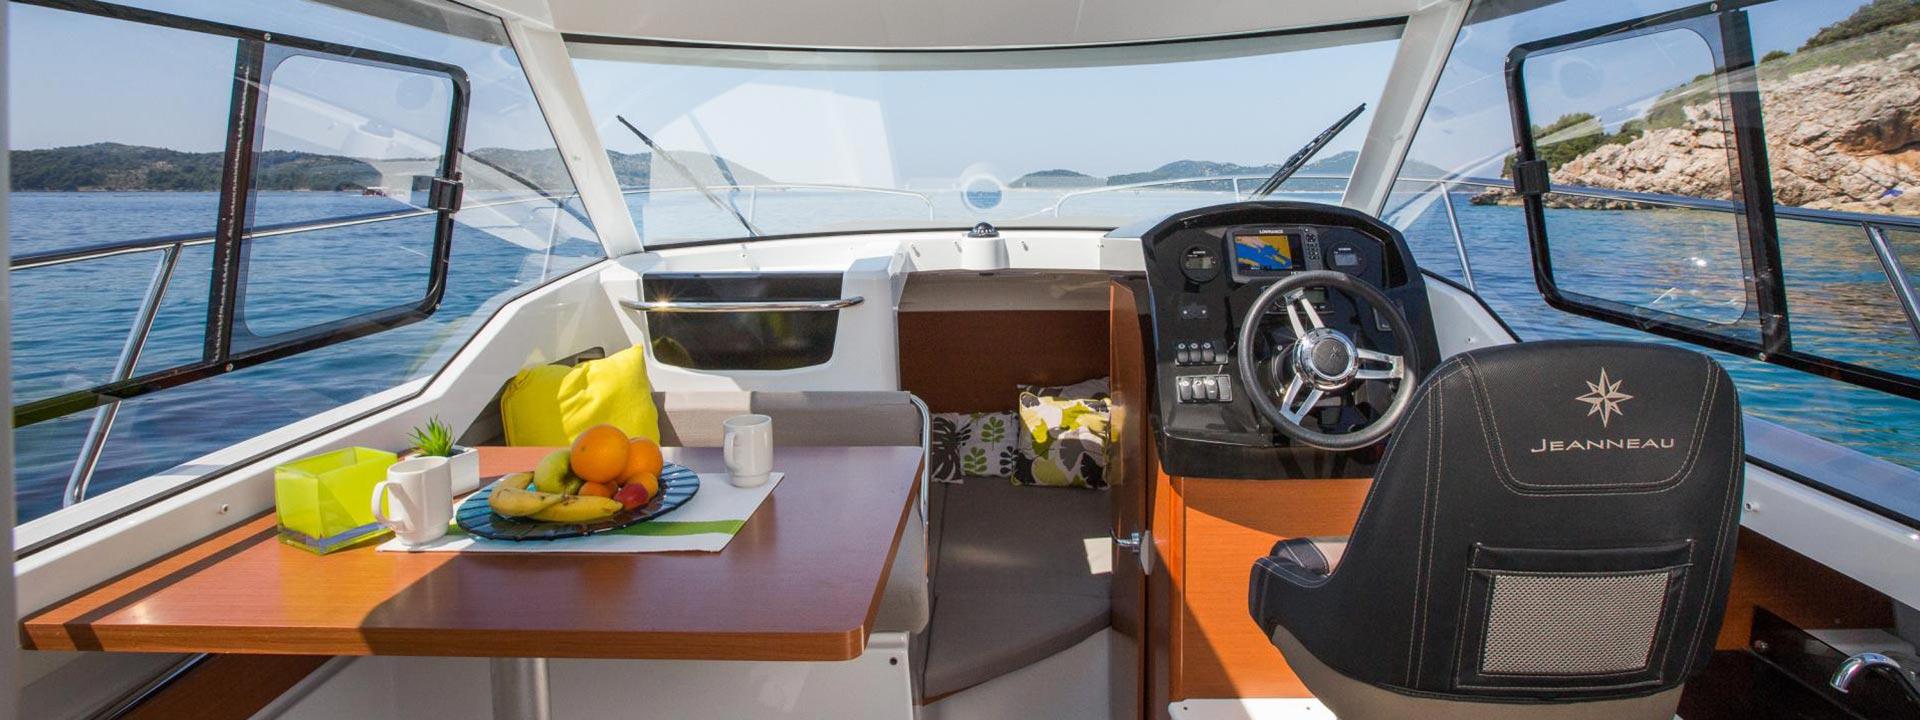 mayer-charter-boat-header-jeanneau-merry-fisher-795-03